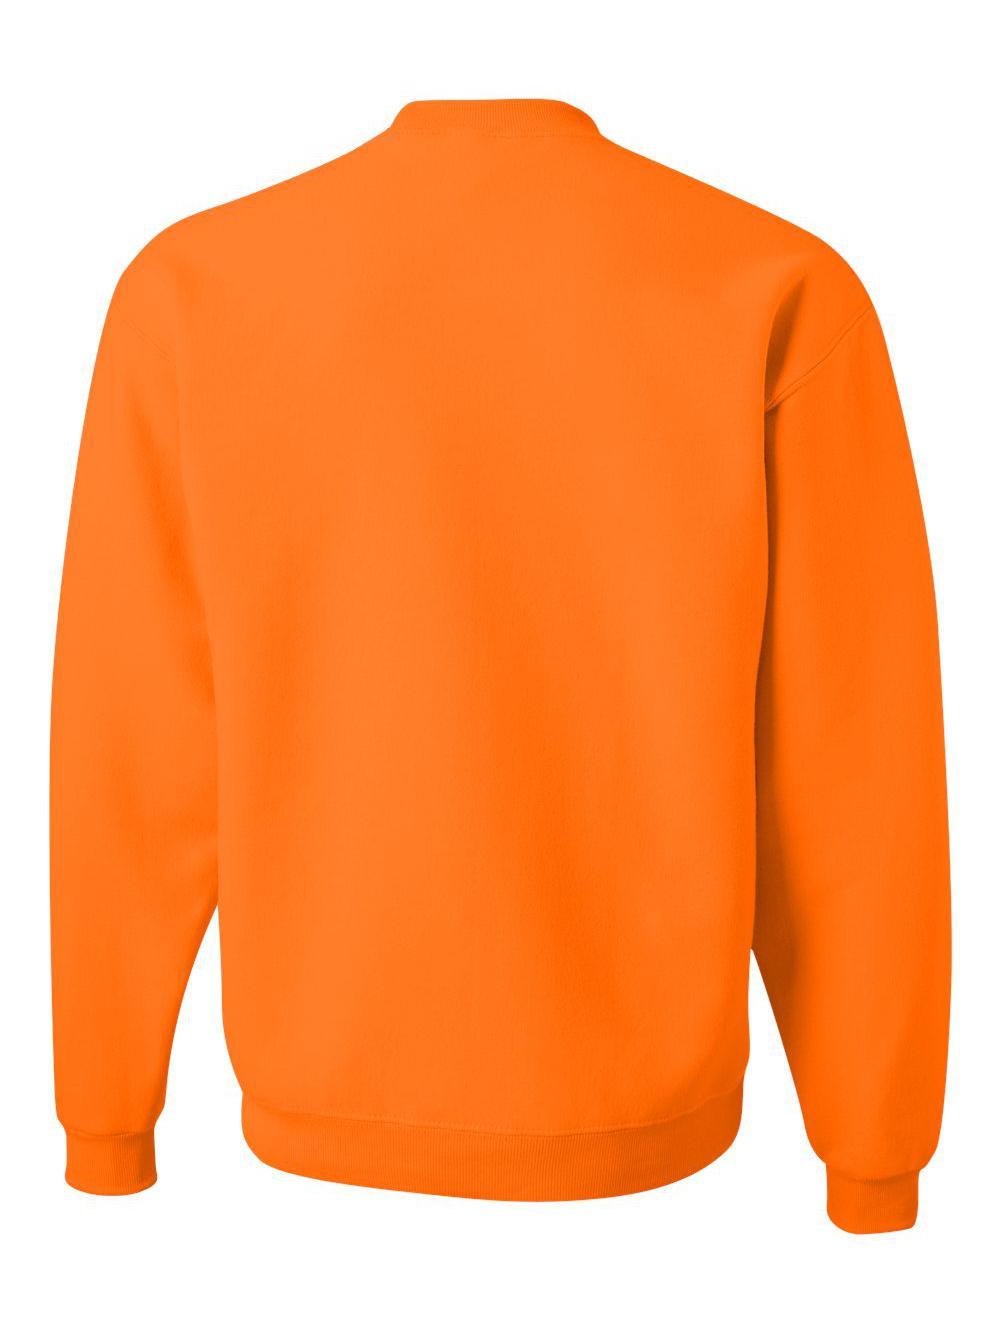 Jerzees-NuBlend-Crewneck-Sweatshirt-562MR thumbnail 79